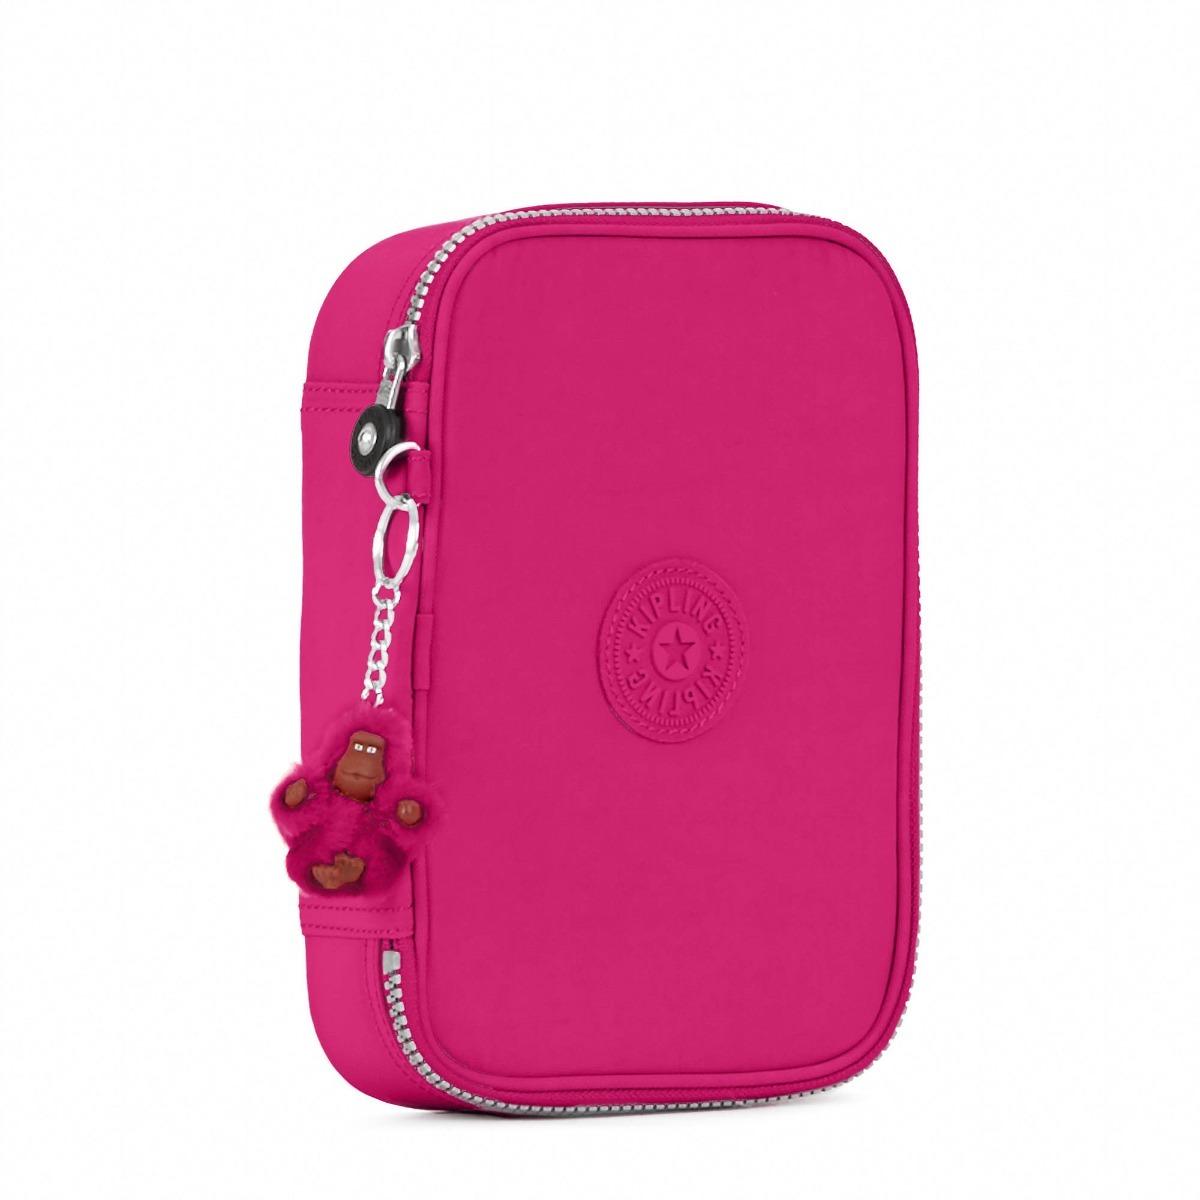 aee980f86 lapicera kipling 100 pen pink very berry 100% original! Cargando zoom.